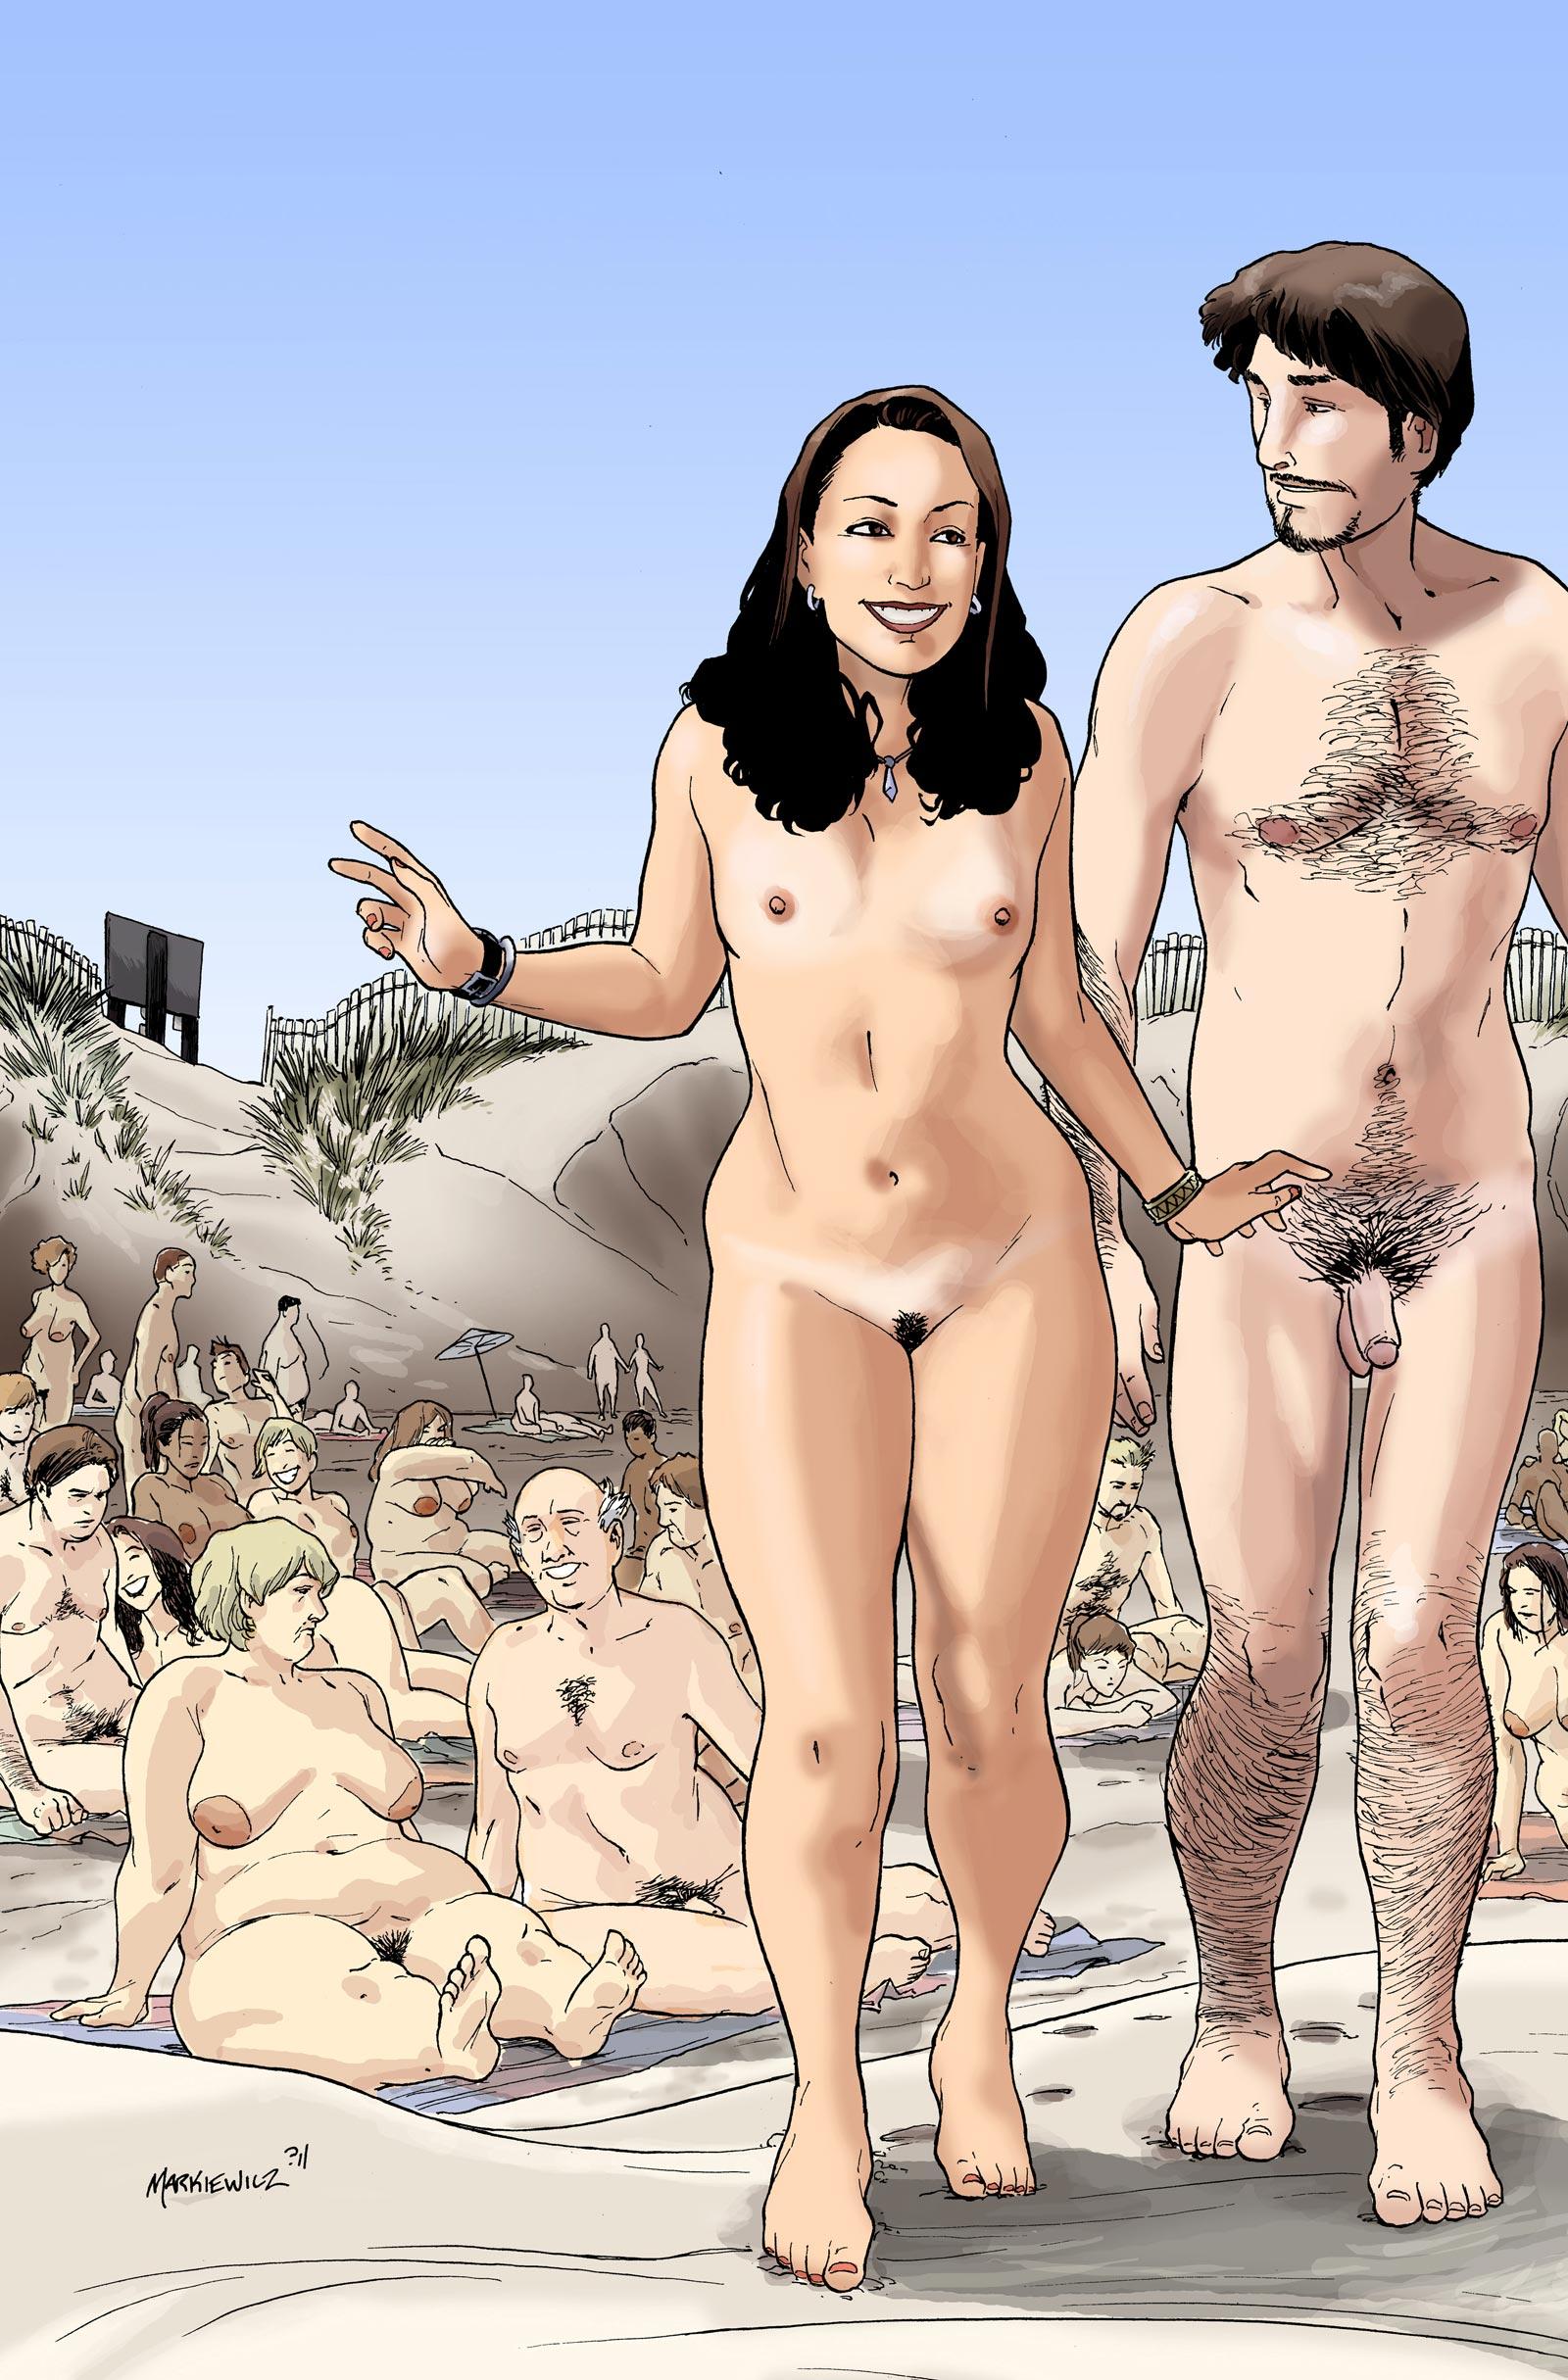 Bbw girls with bush nude